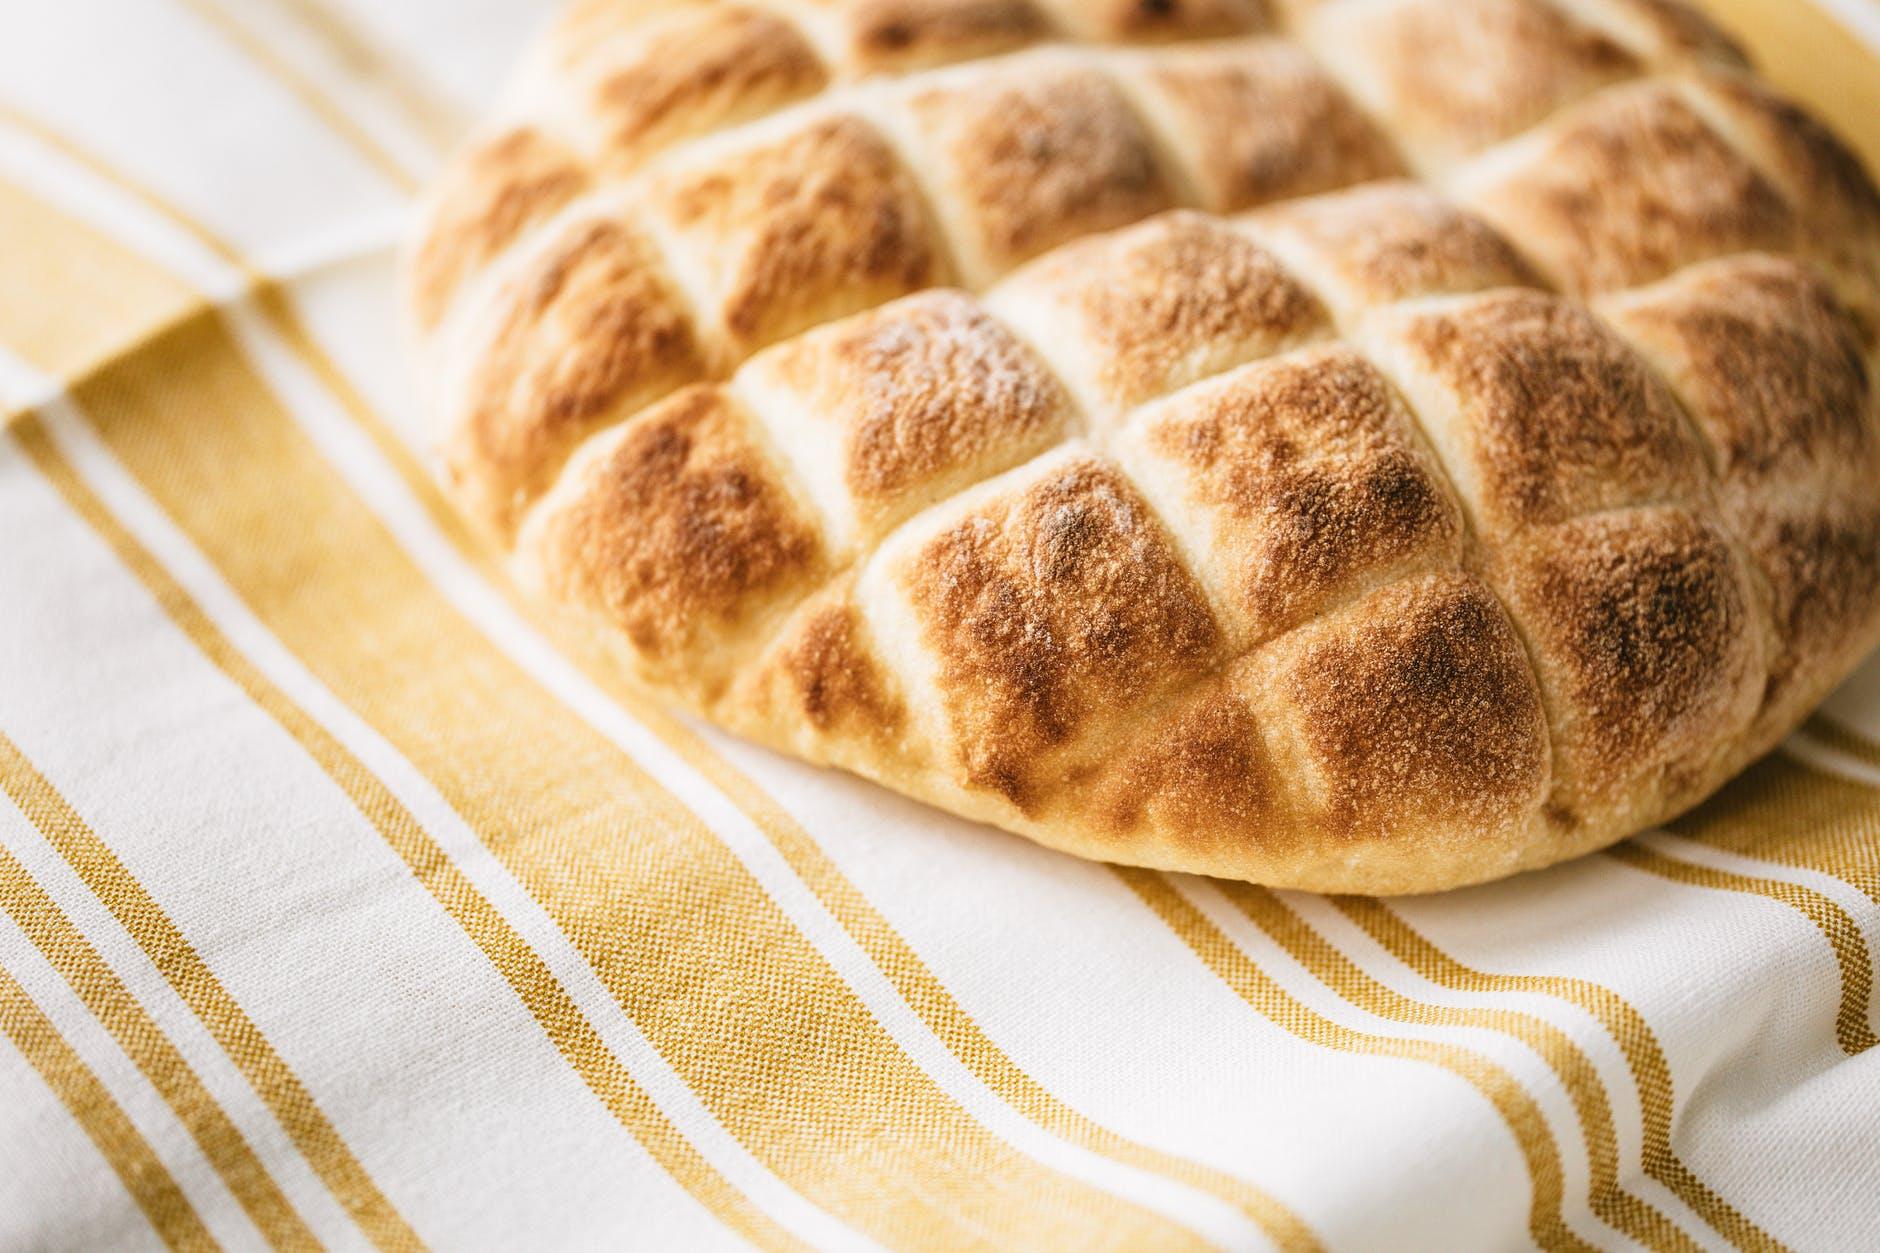 naan or flat bread